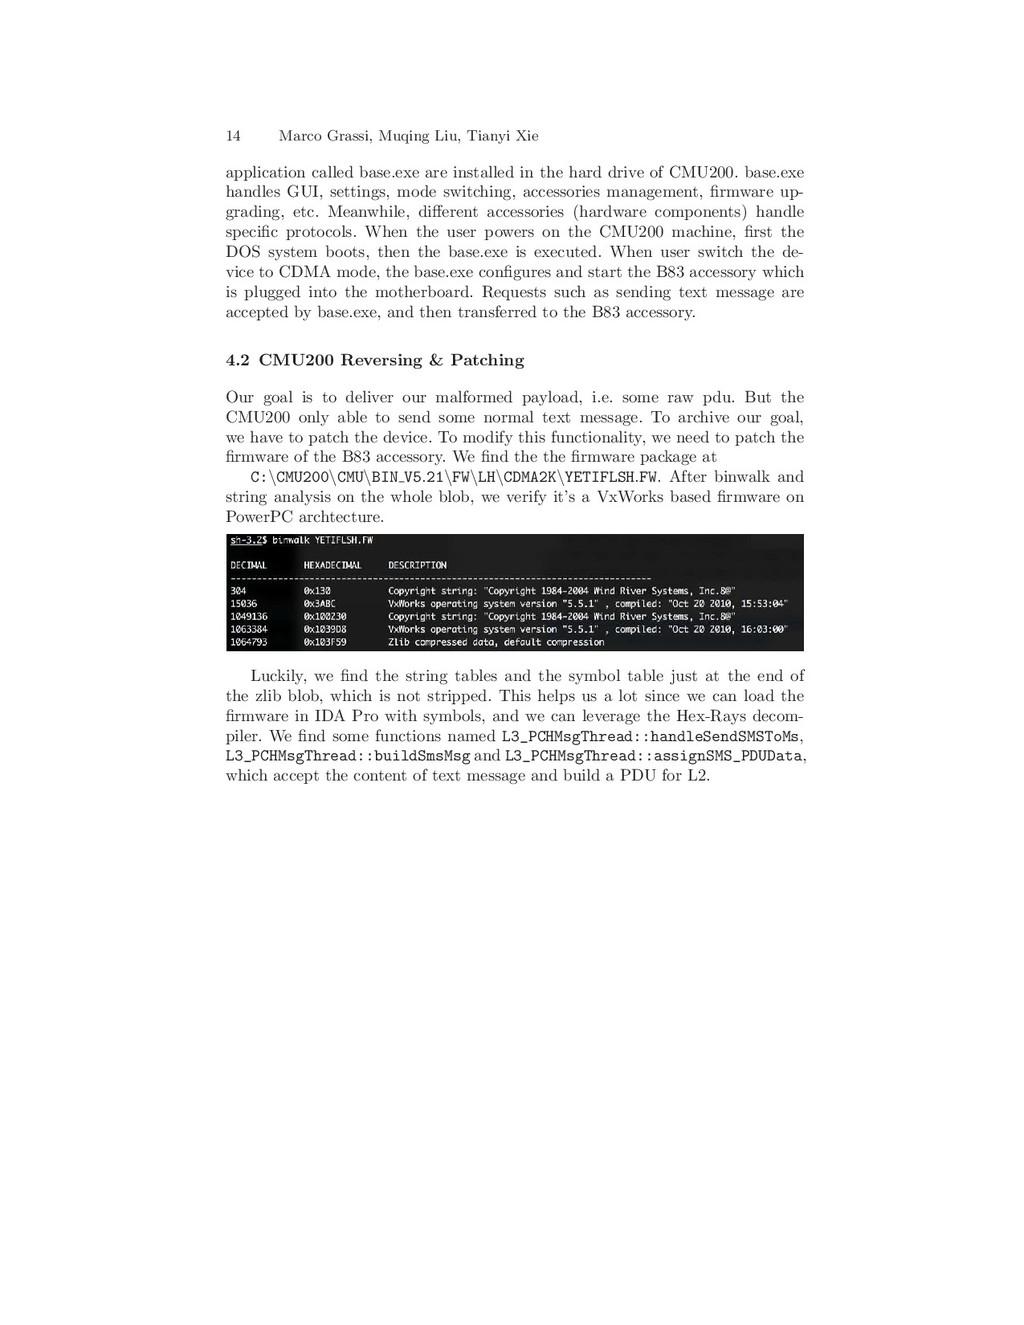 14 Marco Grassi, Muqing Liu, Tianyi Xie applica...